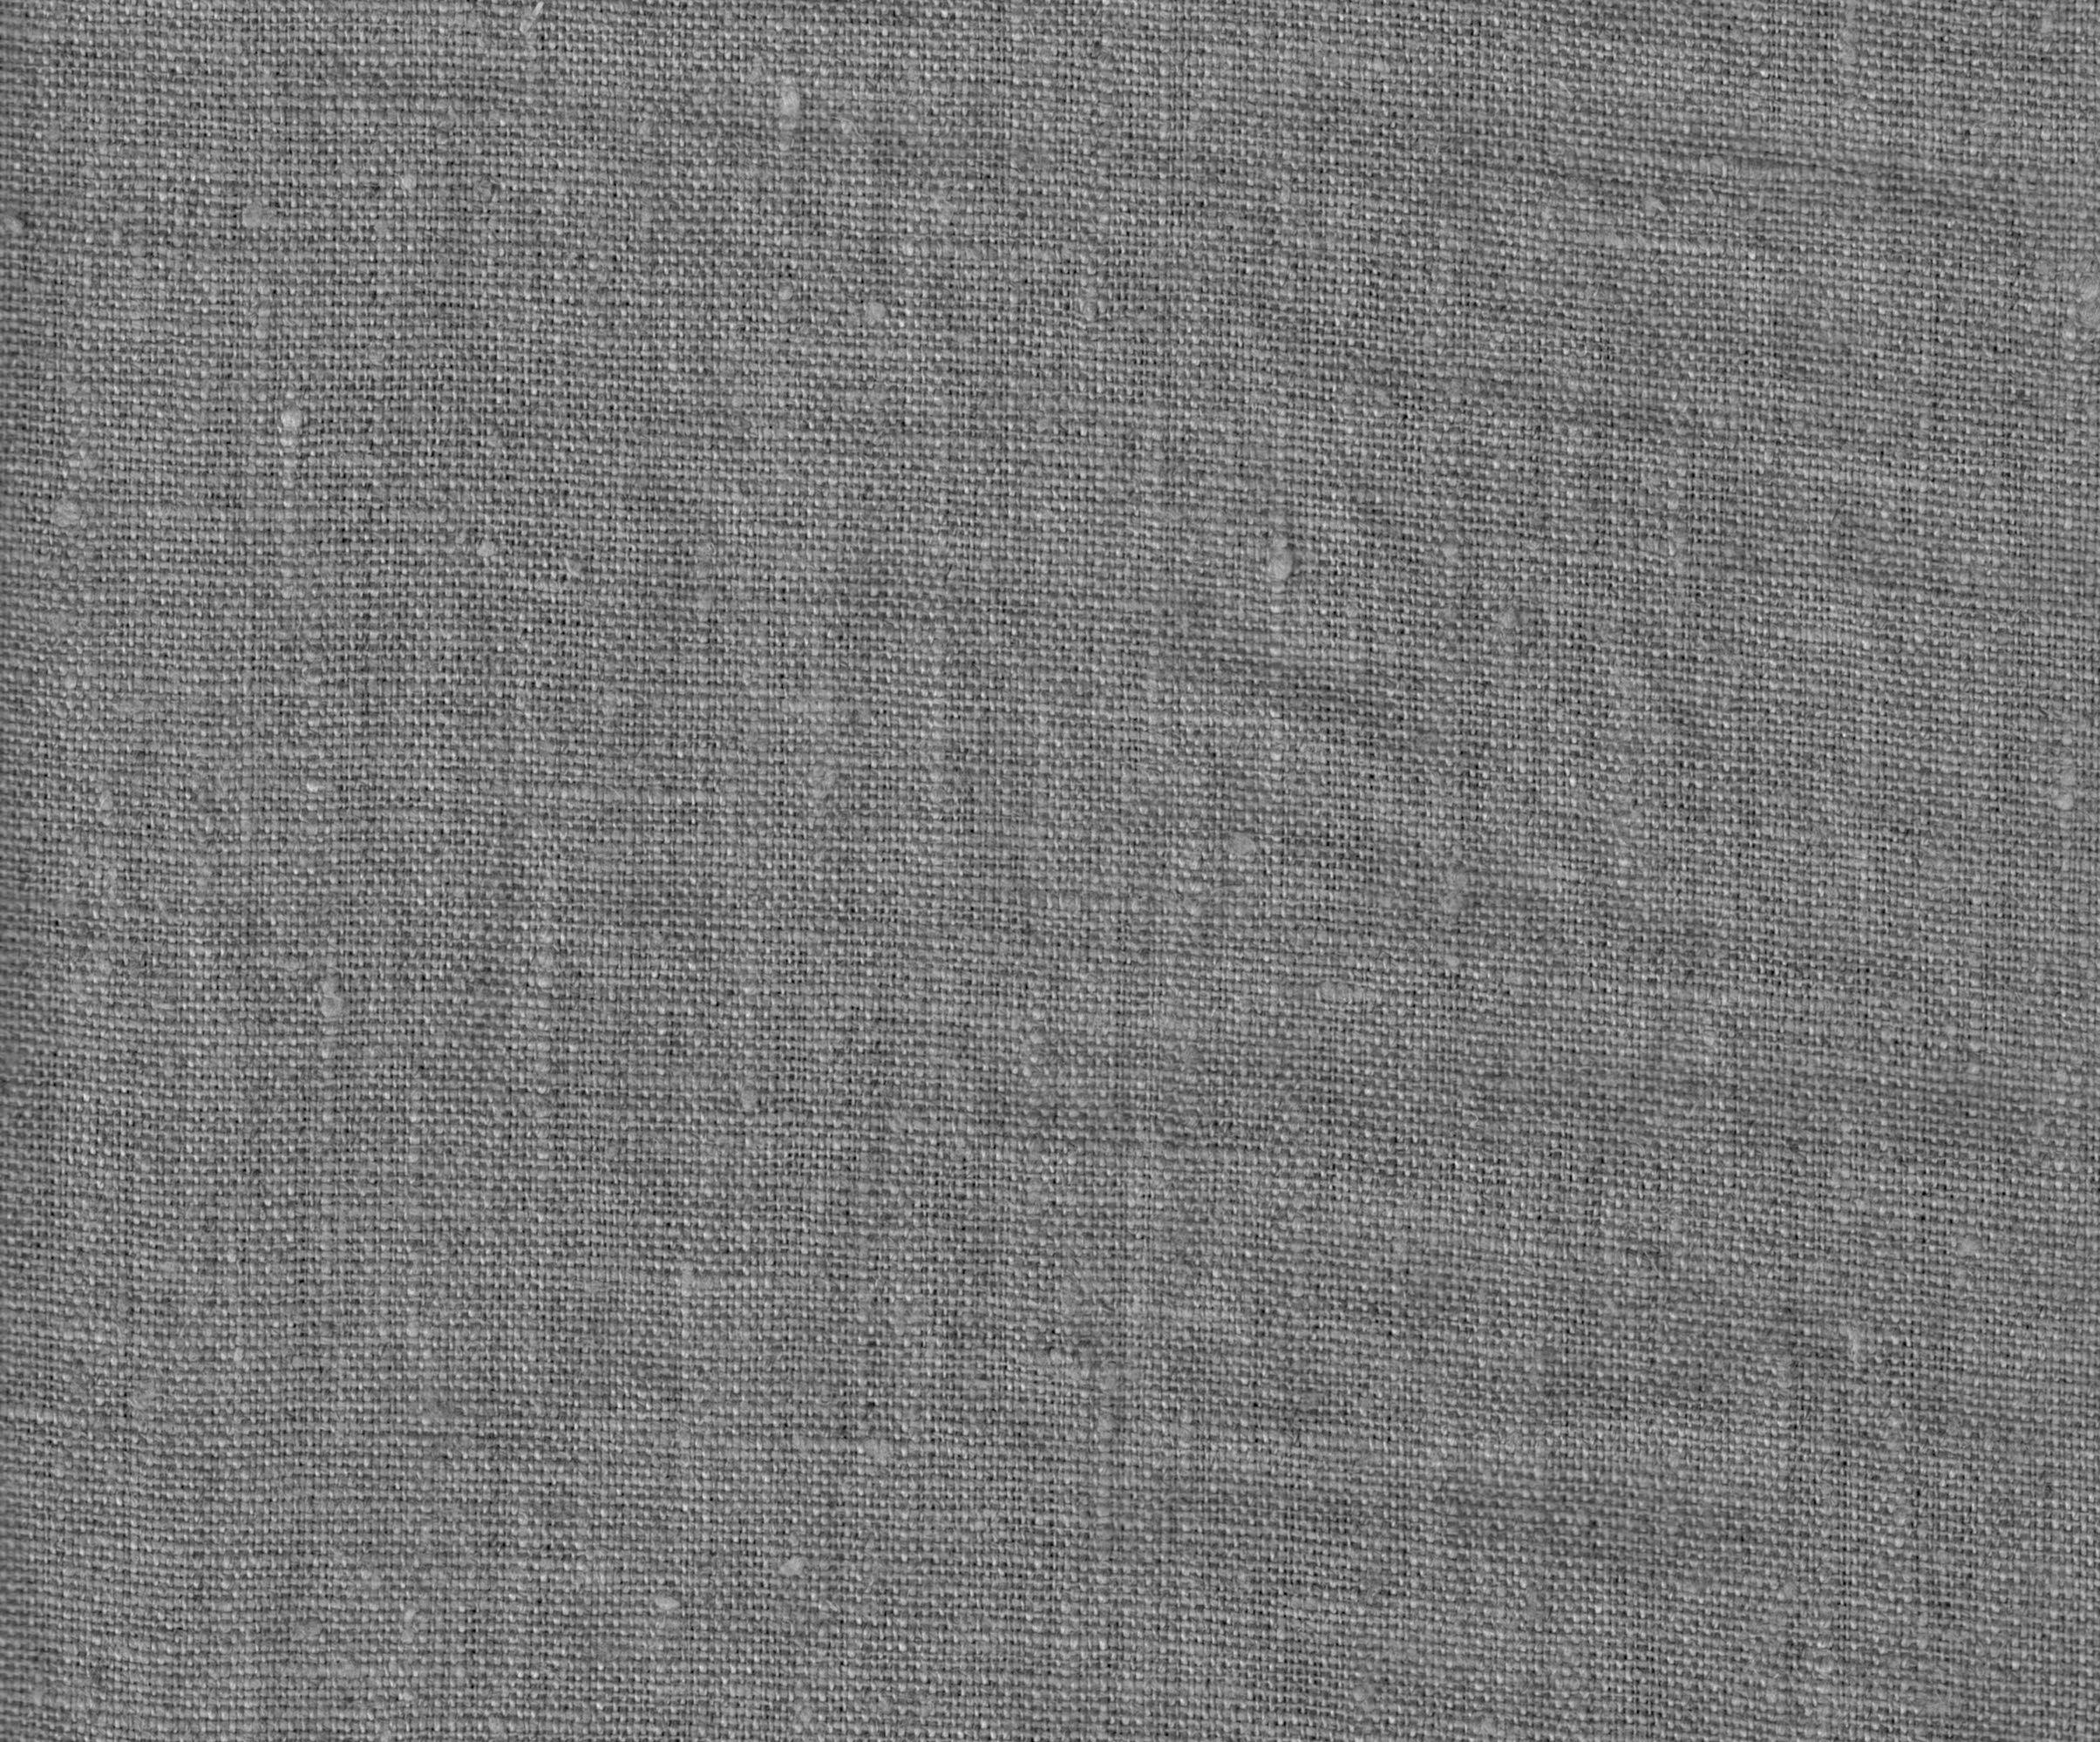 tissu lin naturel largeur 150 cm 100 lin bord de mer pinterest tenture. Black Bedroom Furniture Sets. Home Design Ideas